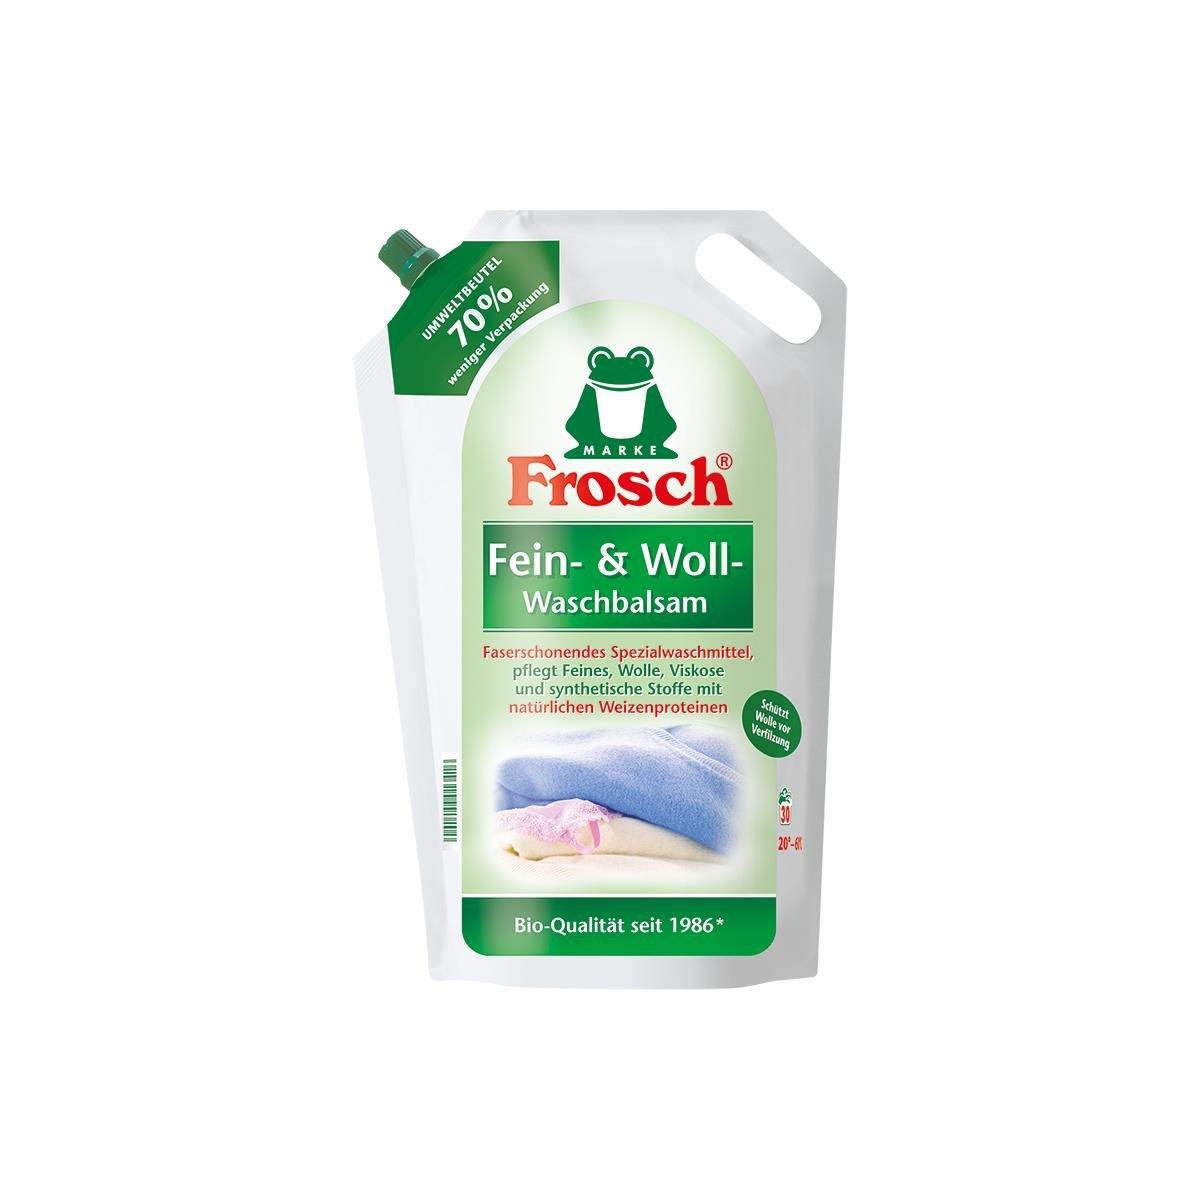 Compartimento interior fina & detergente, 1er Pack (1 x 1.8 l ...